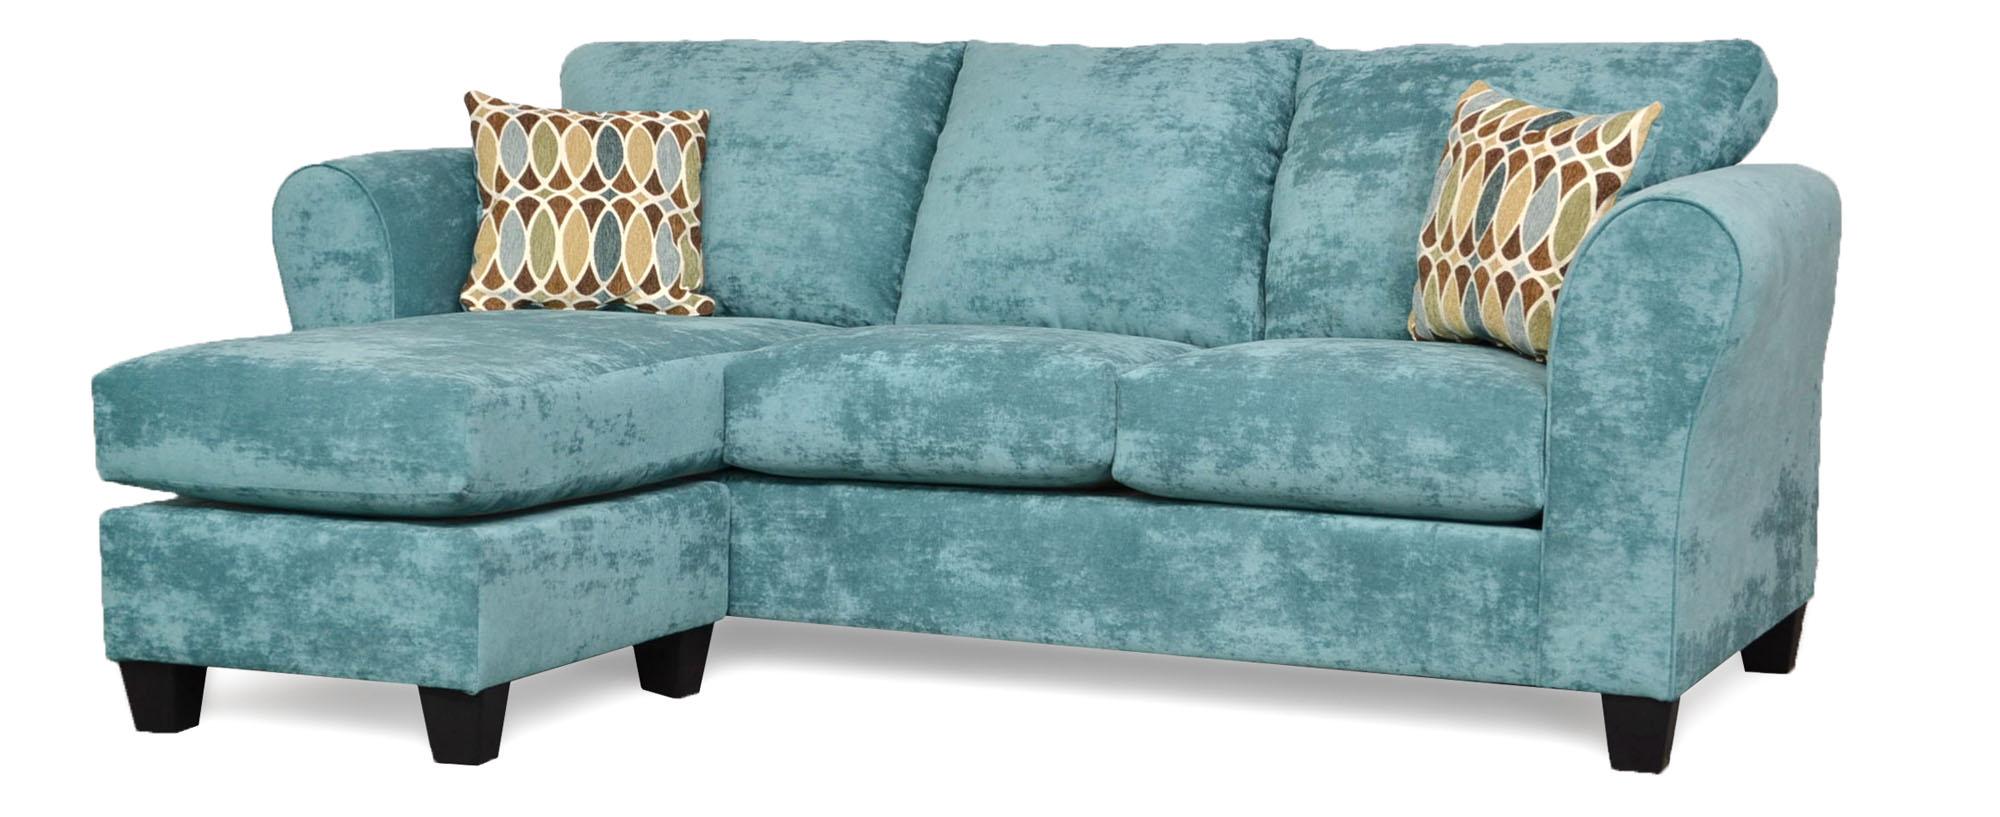 1000 Skylar Chofa with Sofa $499